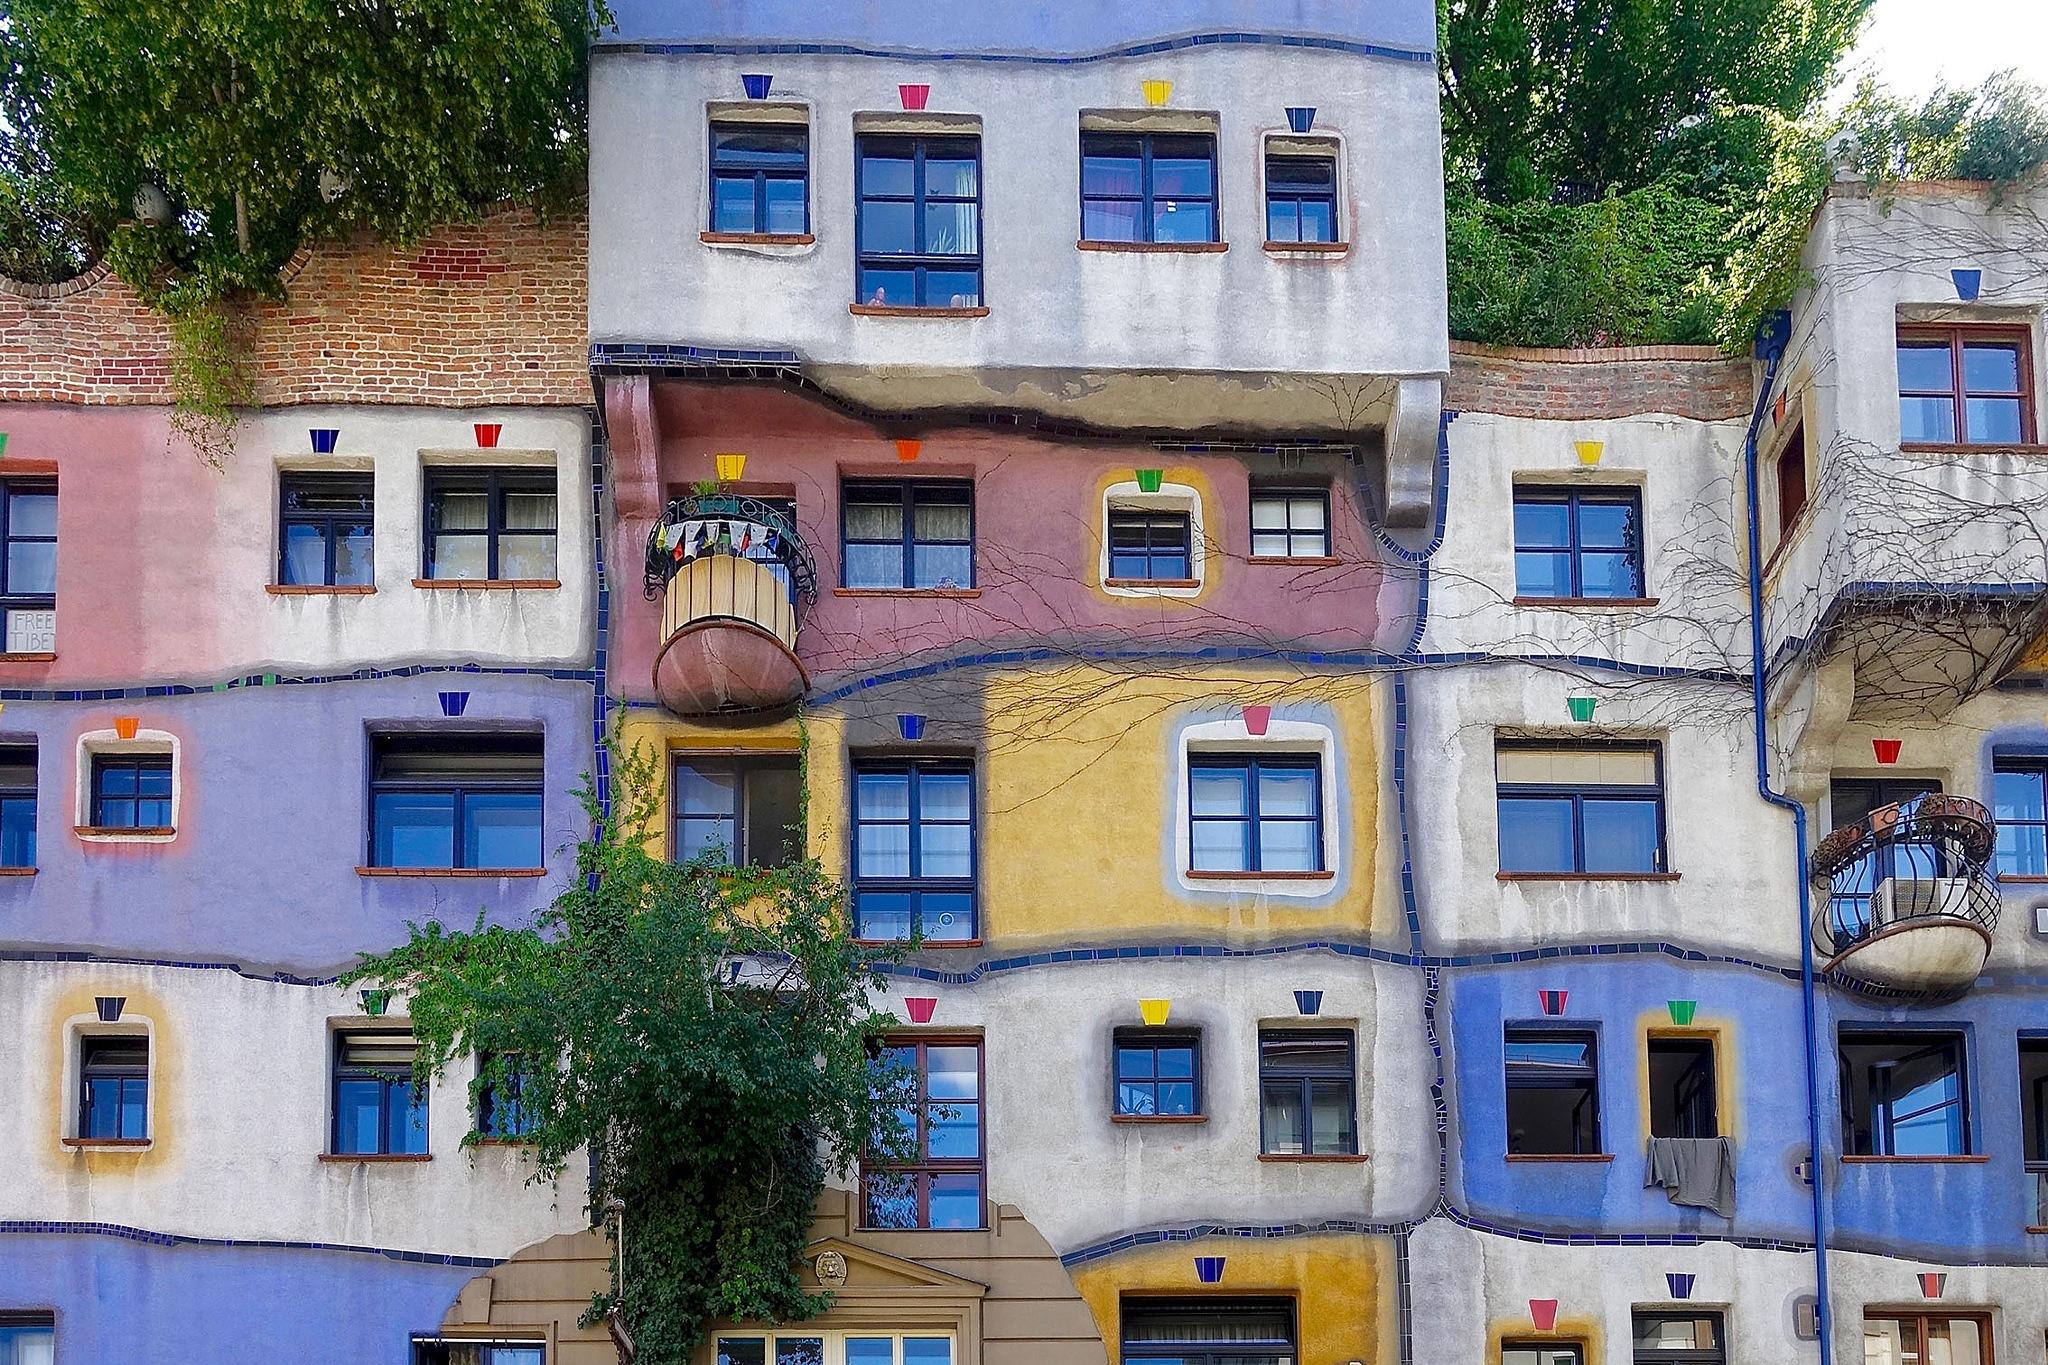 A part of the Hundertwasser house in Vienna, Austria by Erwin Widmer